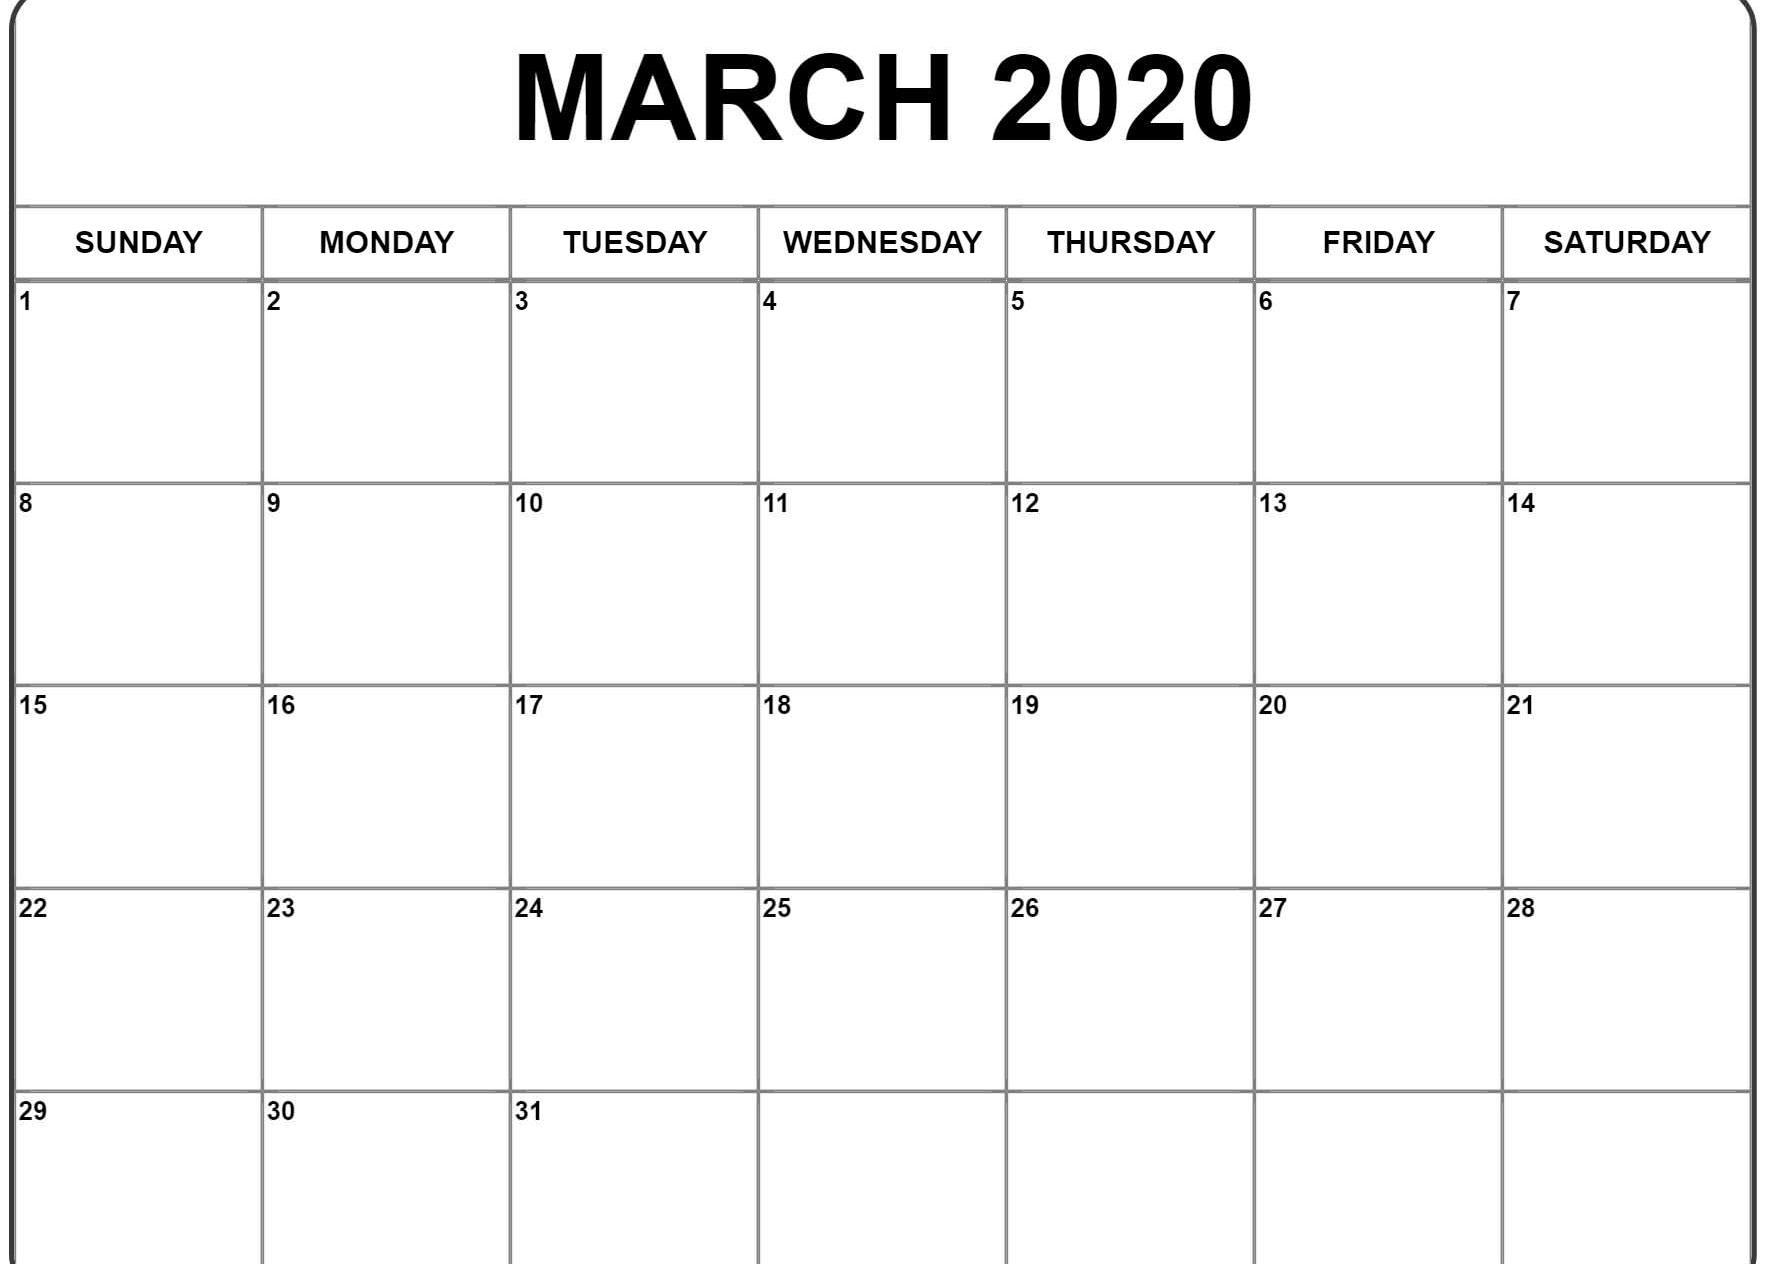 March 2020 Blank Calendar Printable